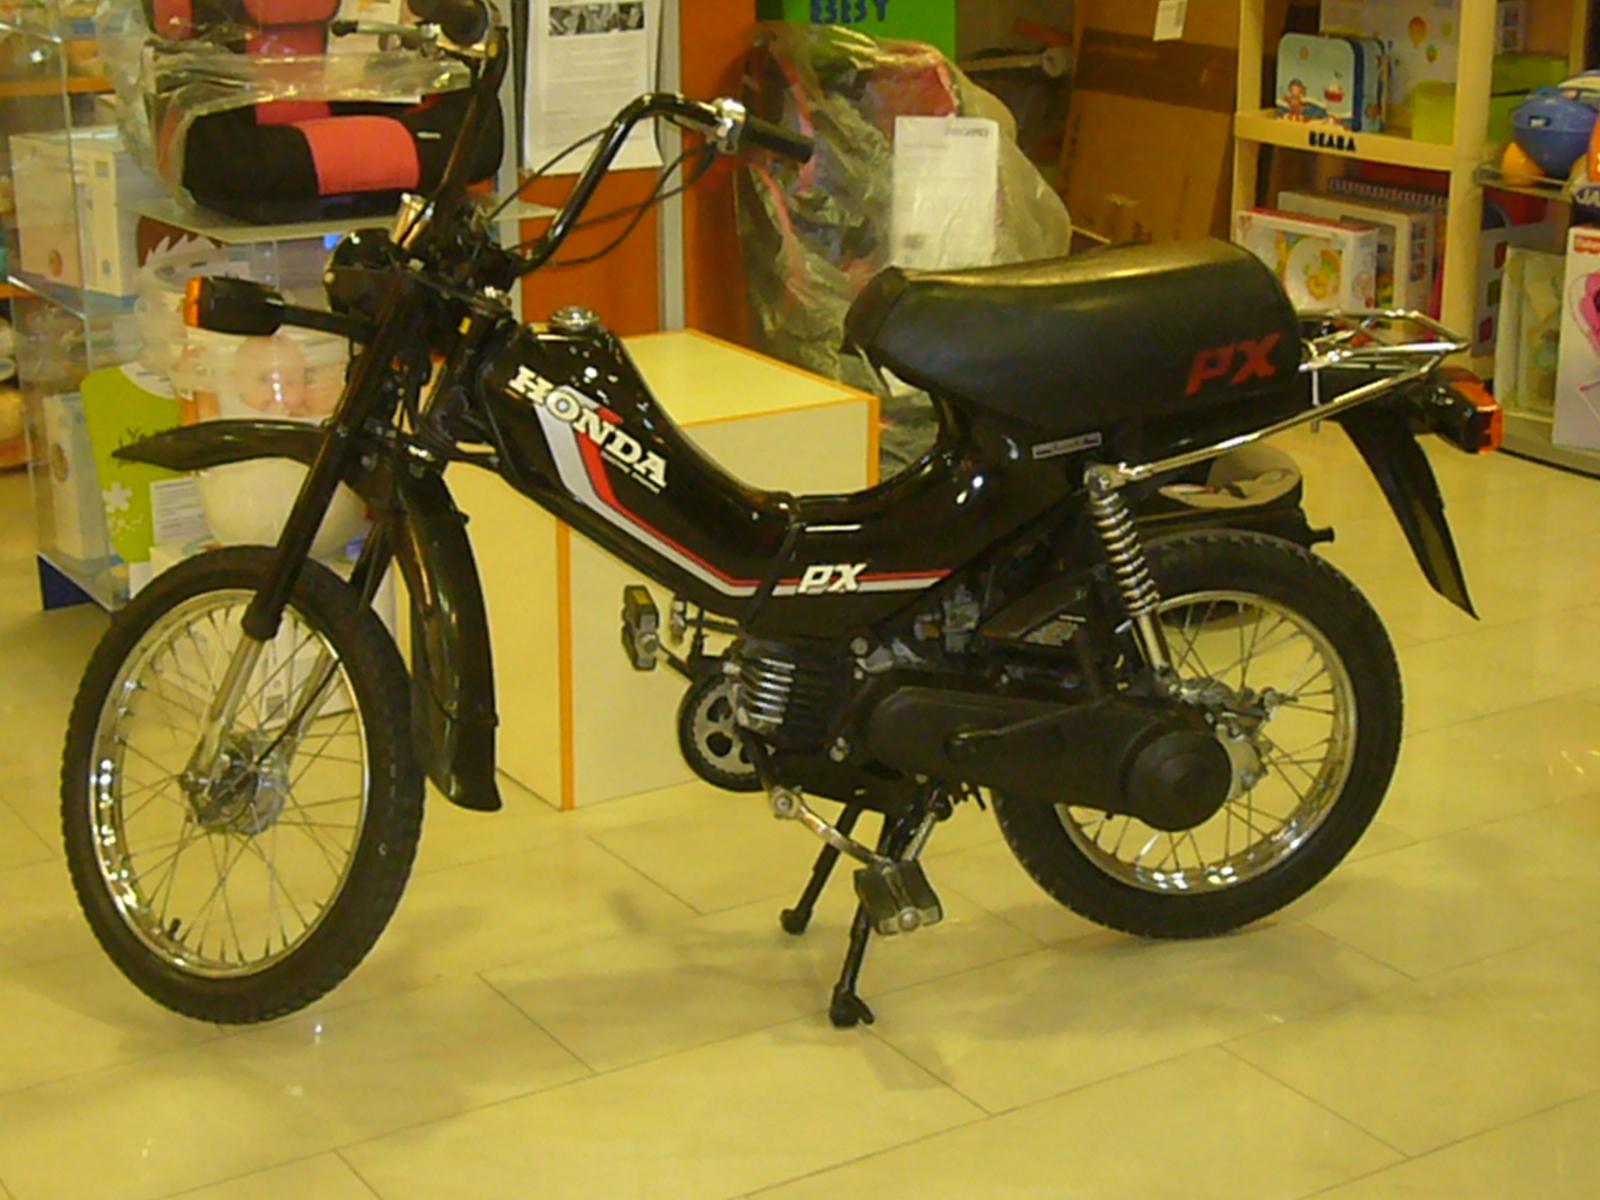 HONDA -  Mi Honda PX '84 - Página 2 4c15c876ad0bff72ac25ce4774692f08o